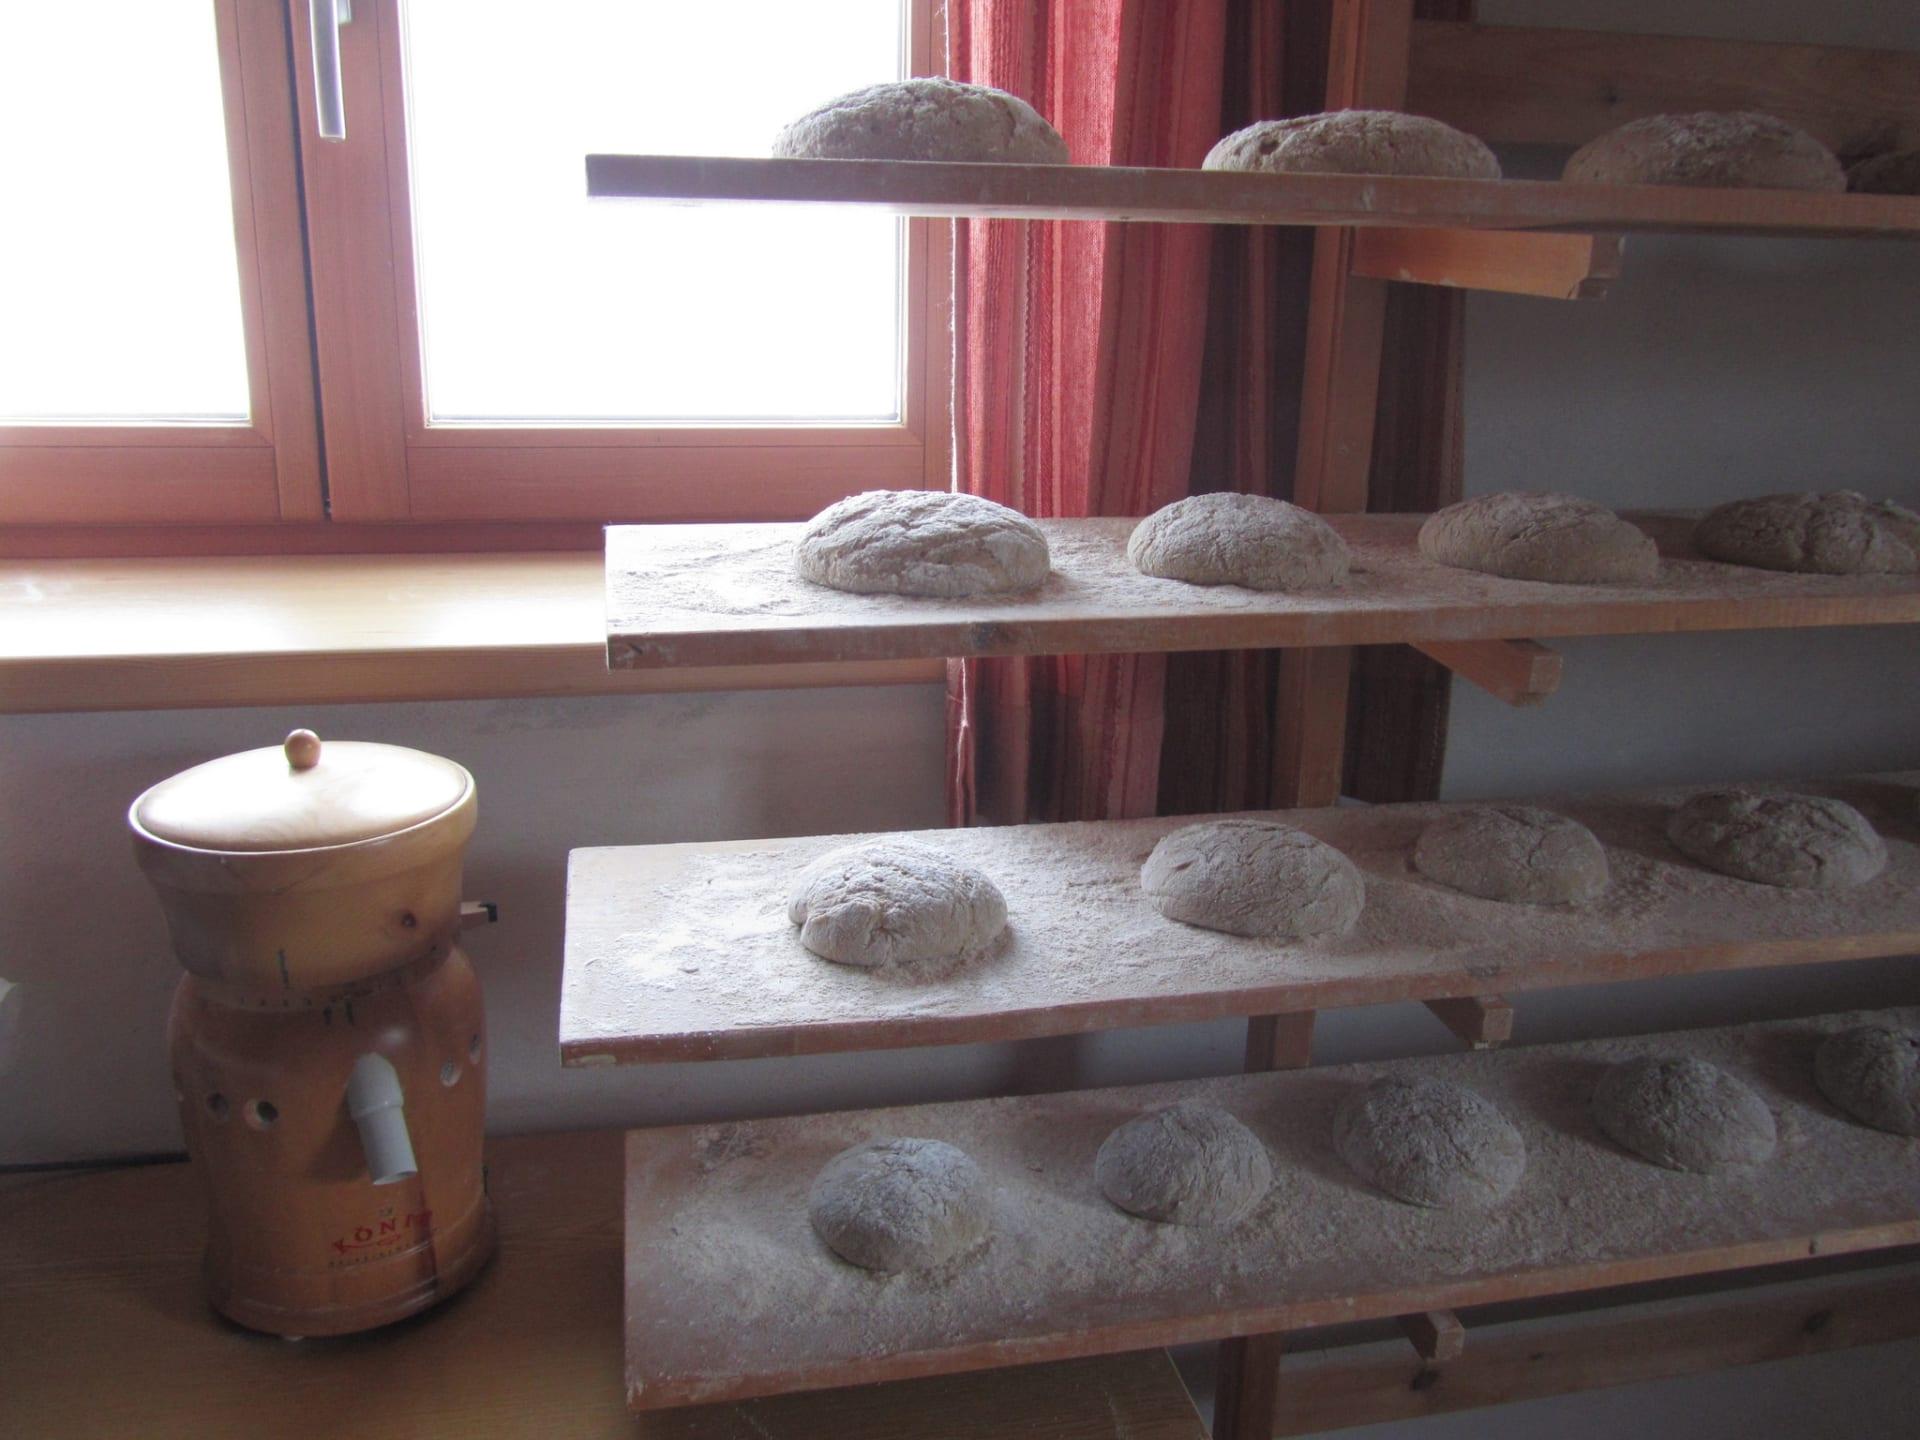 Backtag- bald kommt das Brot in den Ofen!